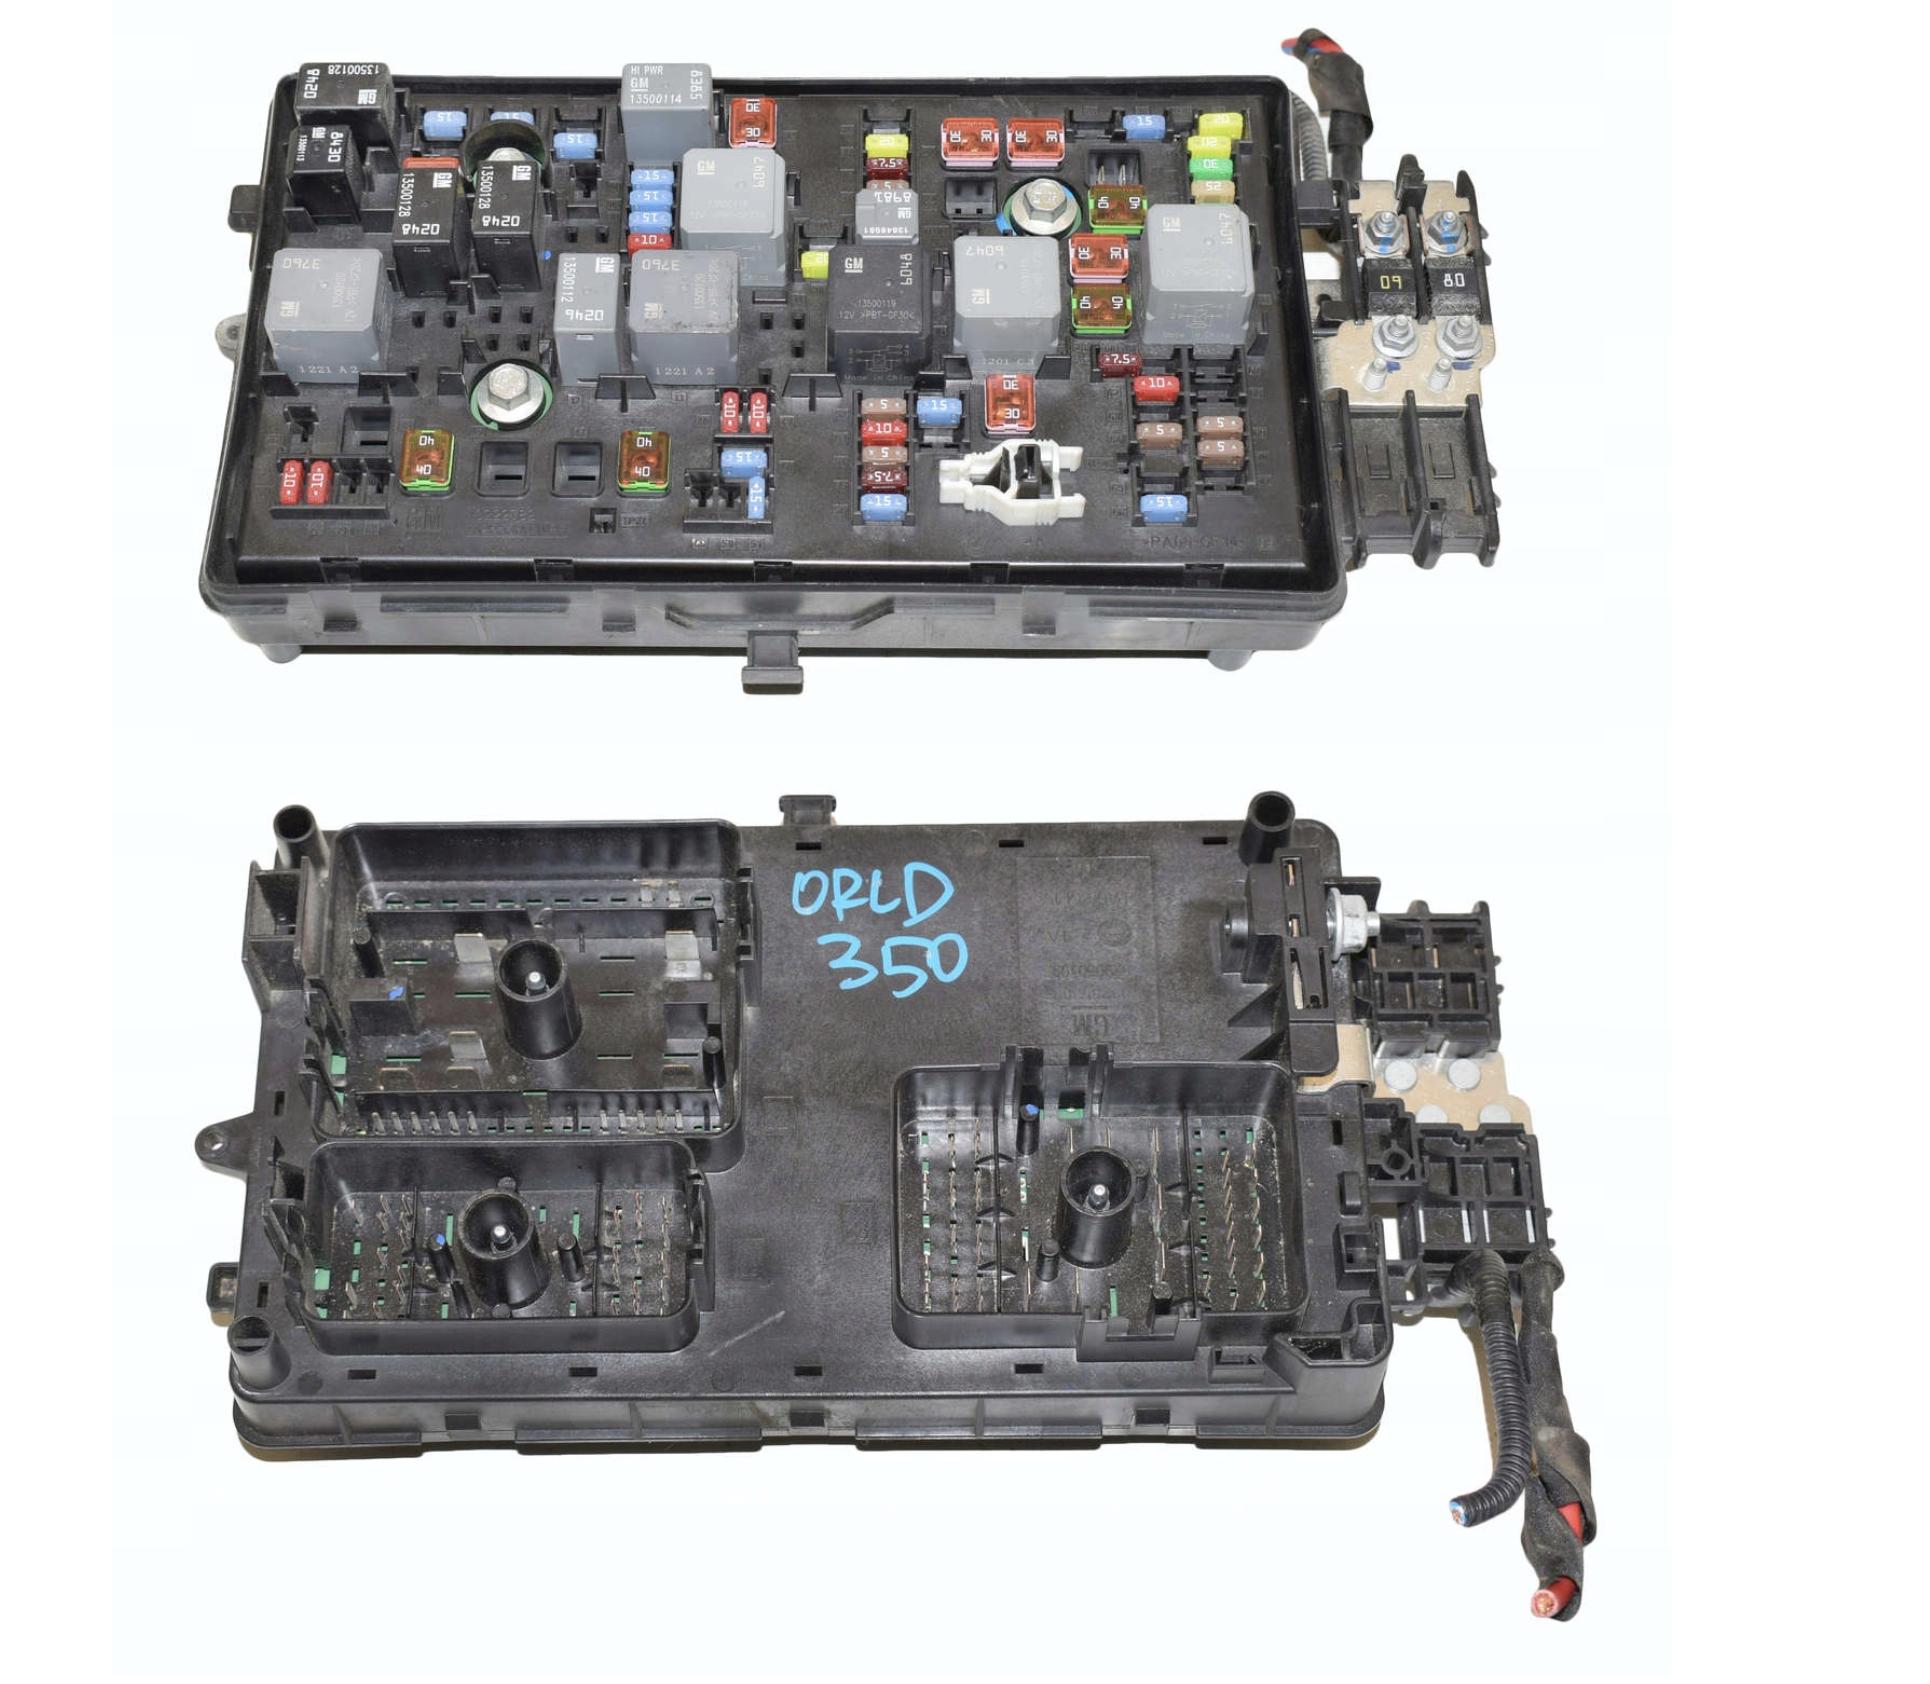 Fuse box module bsi chevrolet orlando 2010-2018 ref 529050199 96982042  13222782 13255300, sale auto spare part on pieces-okaz.com | Chevrolet Orlando Fuse Box |  | PIECES-OKAZ.COM